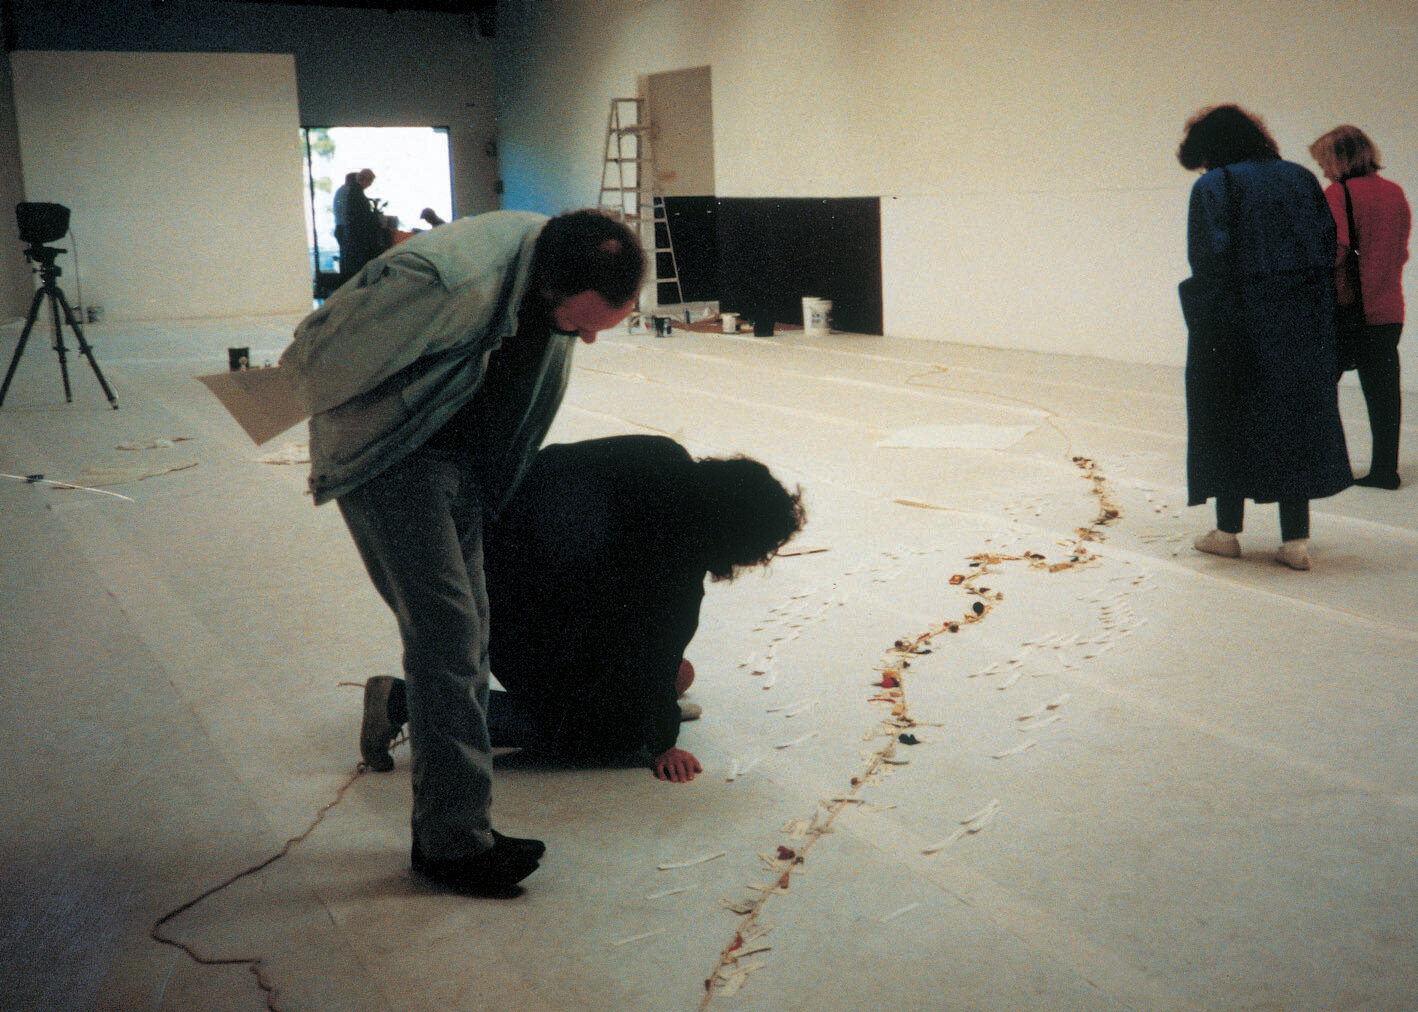 Detail-of-installation-Fred-Hoffman-Gallery-Santa-Monica-1990-Photo-by-David-Fanillian-2Deta.jpg